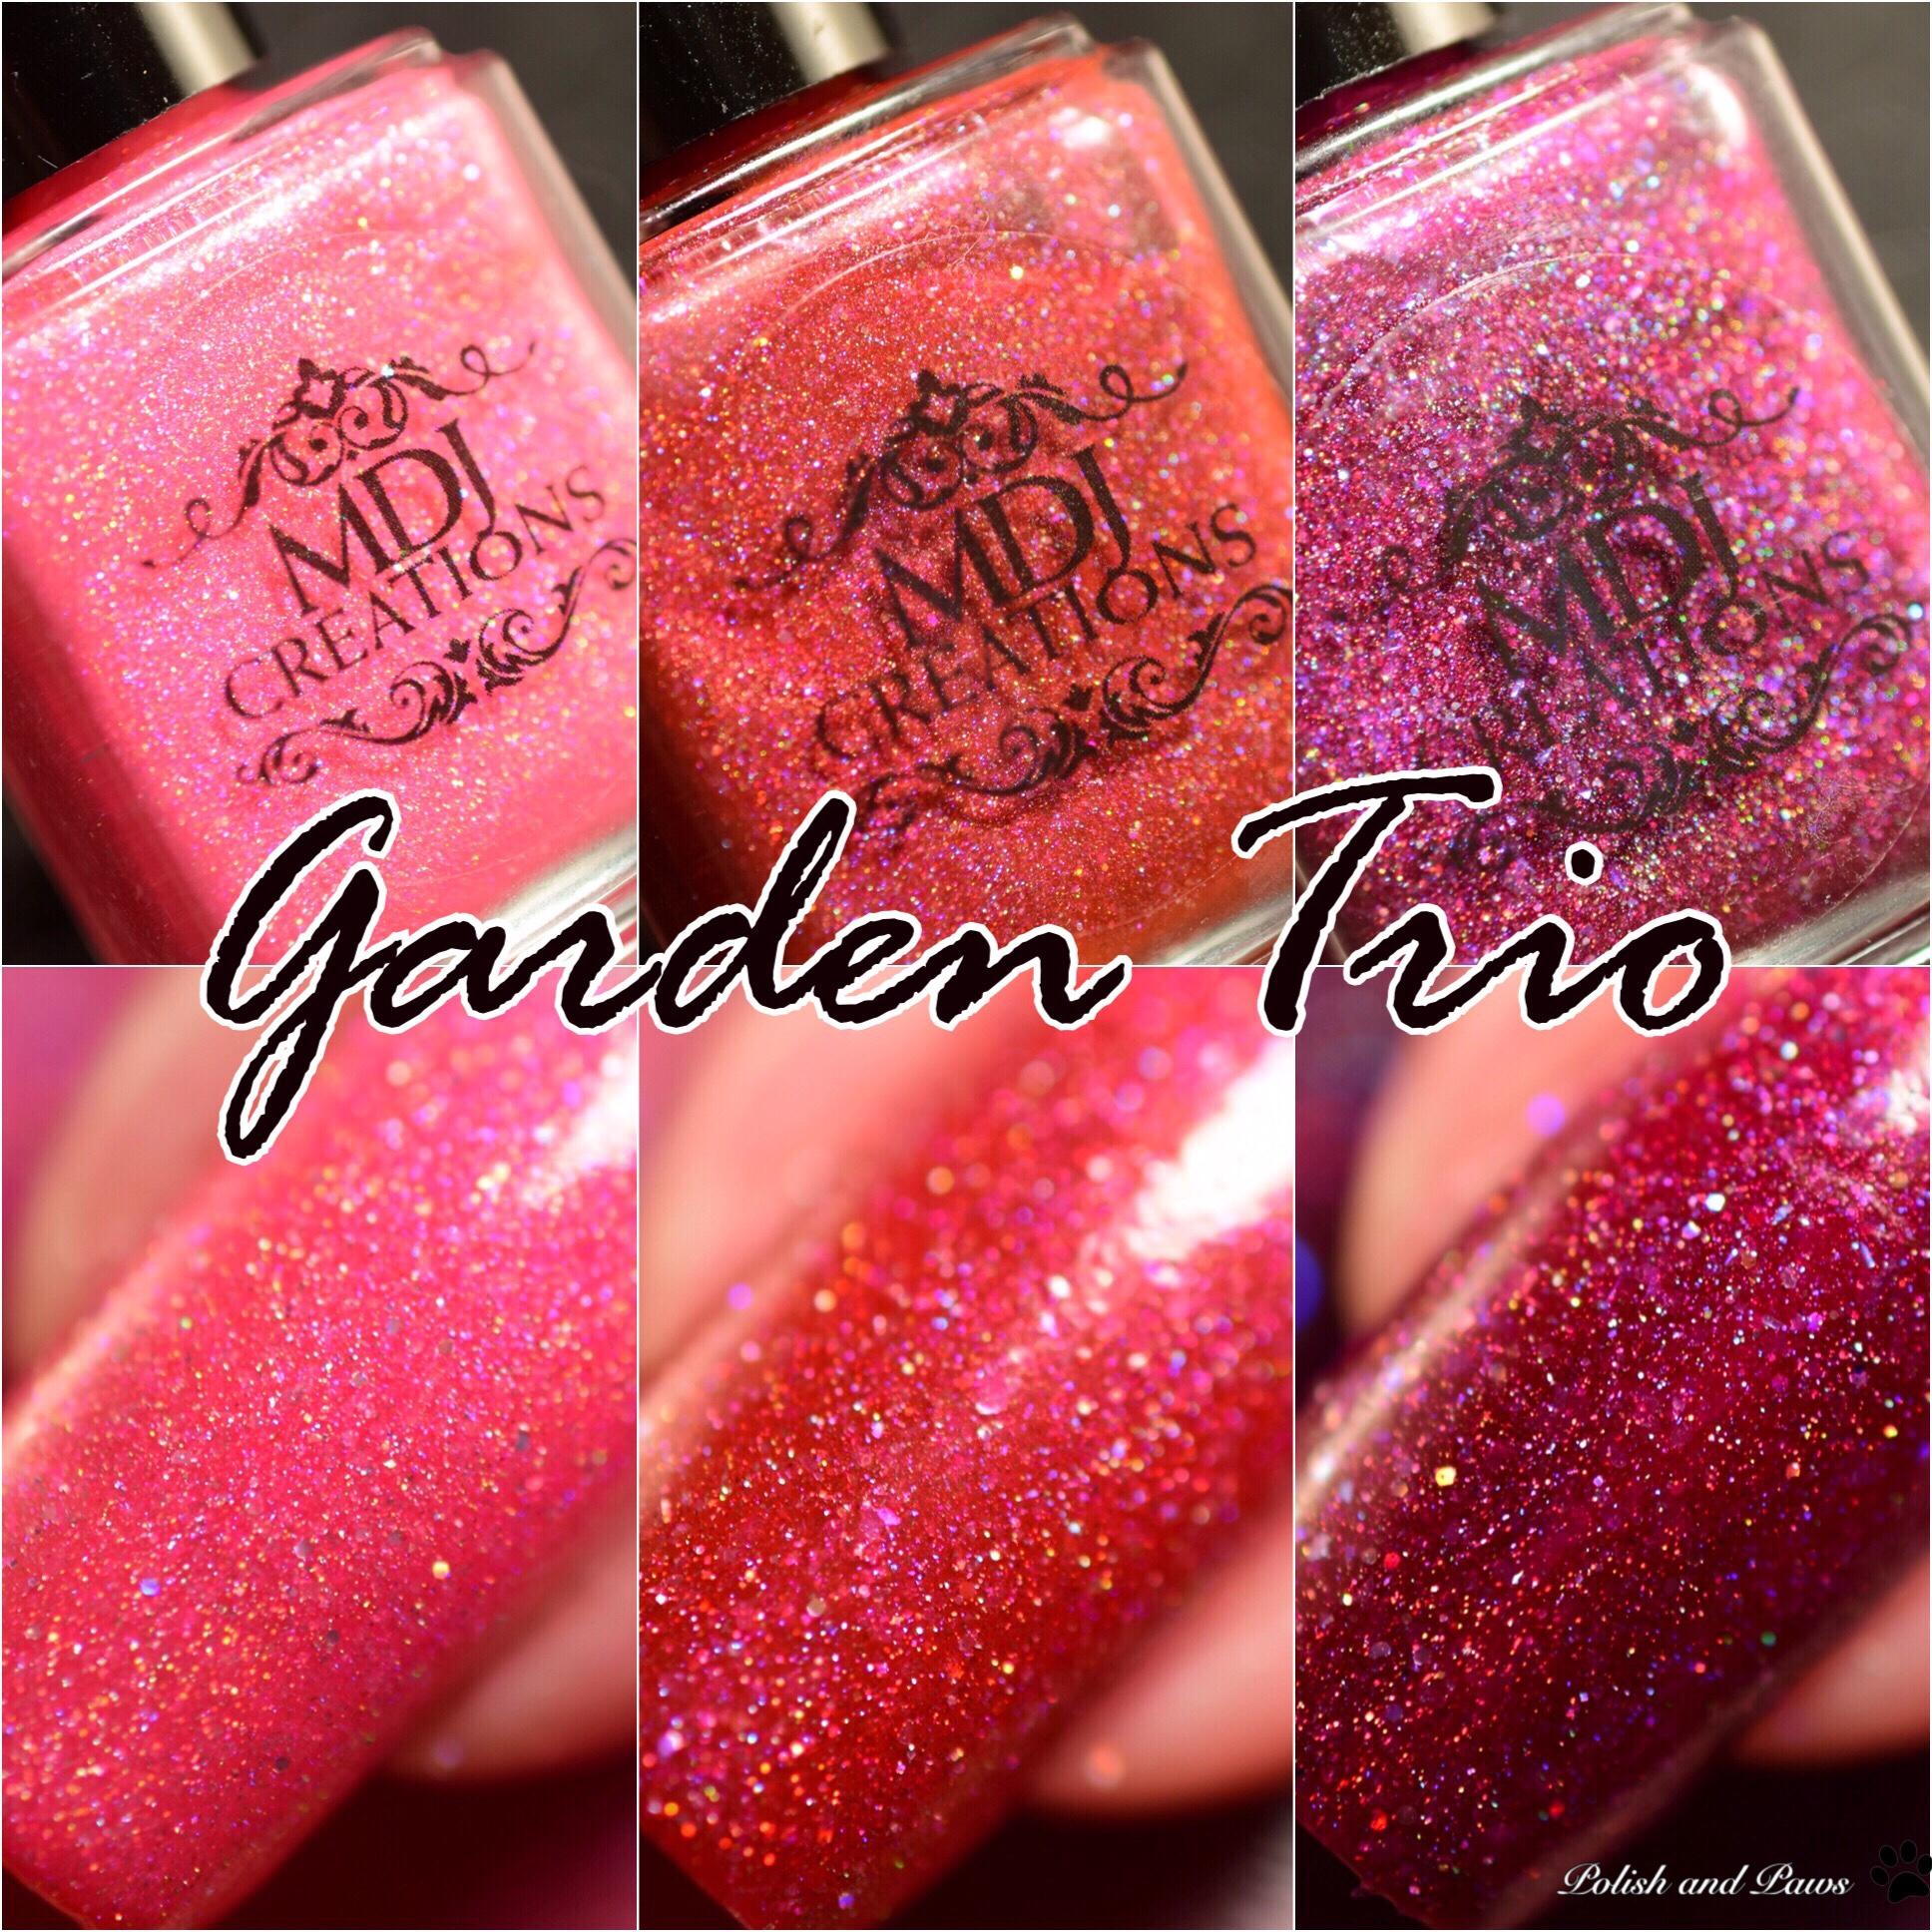 MDJ Creations Garden Trio